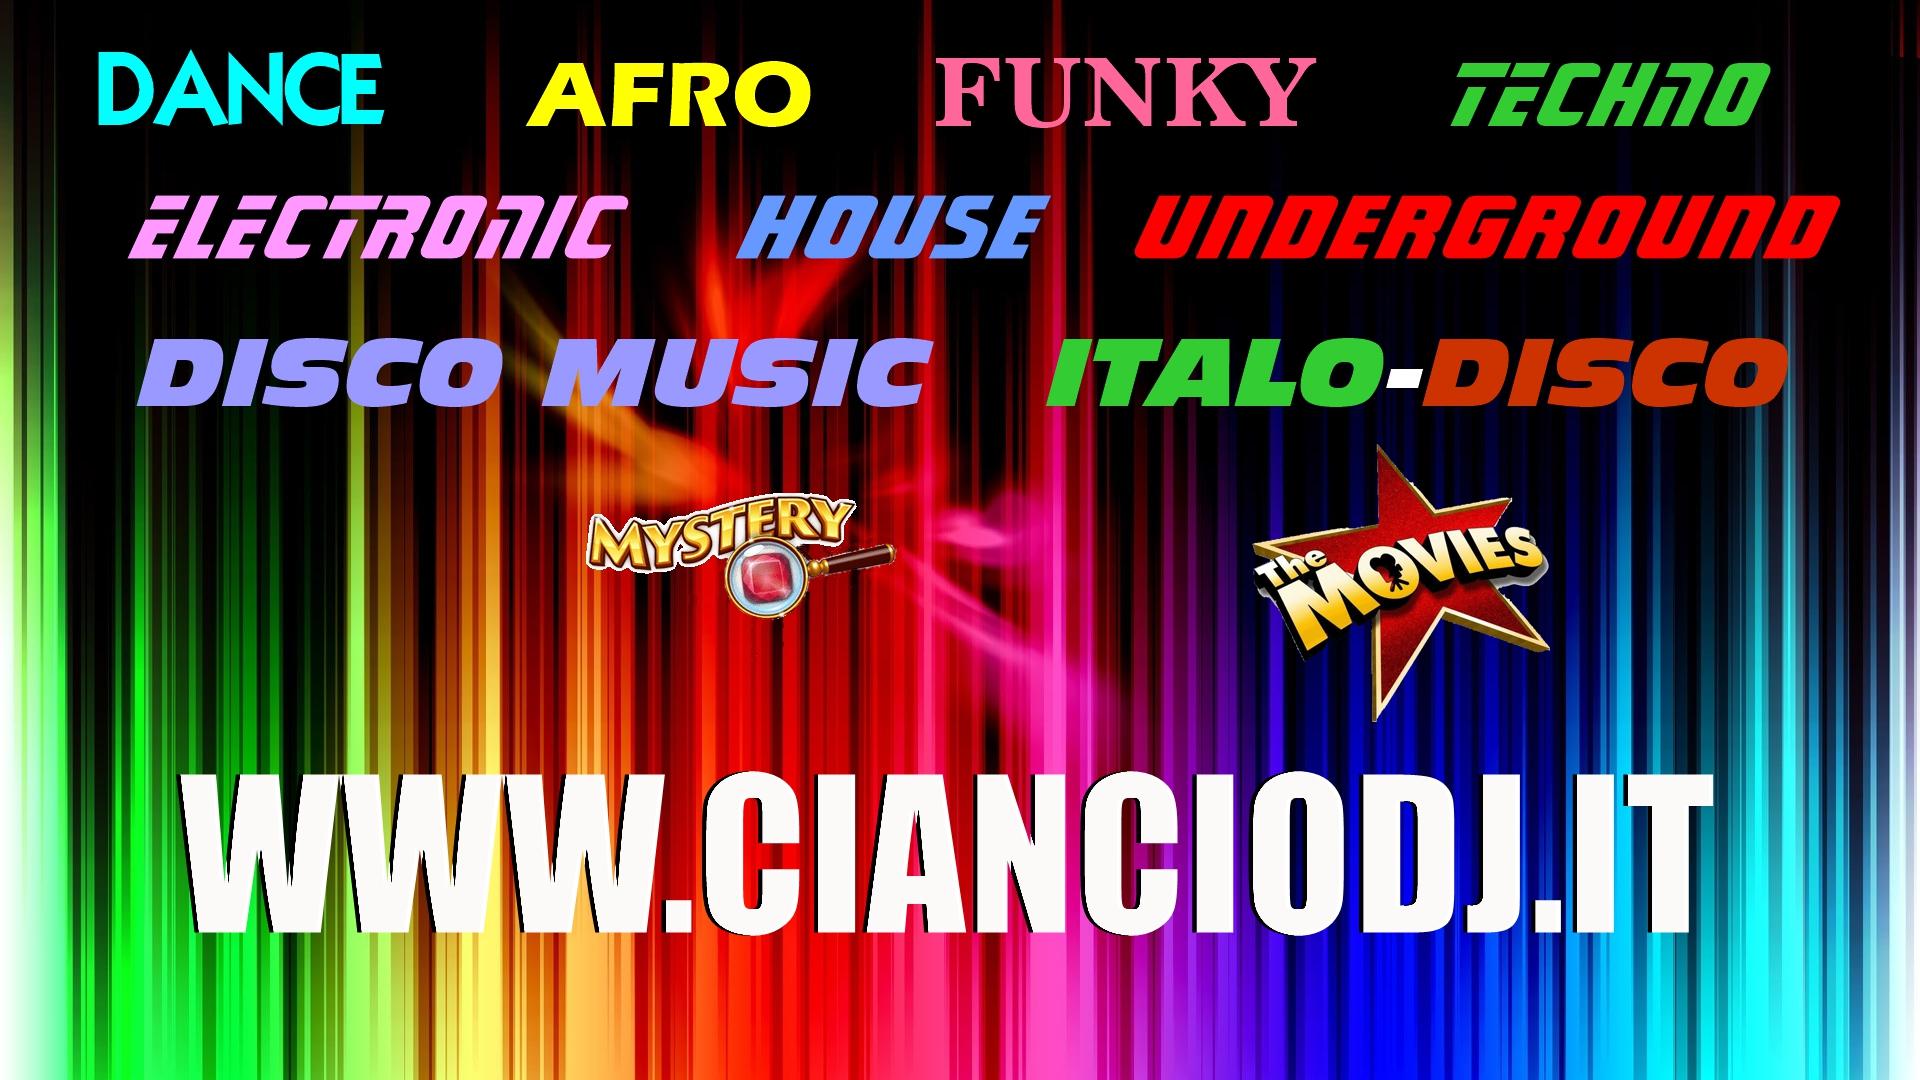 Sito Ufficiale Ciancio DJ - Official Website of Ciancio DJ